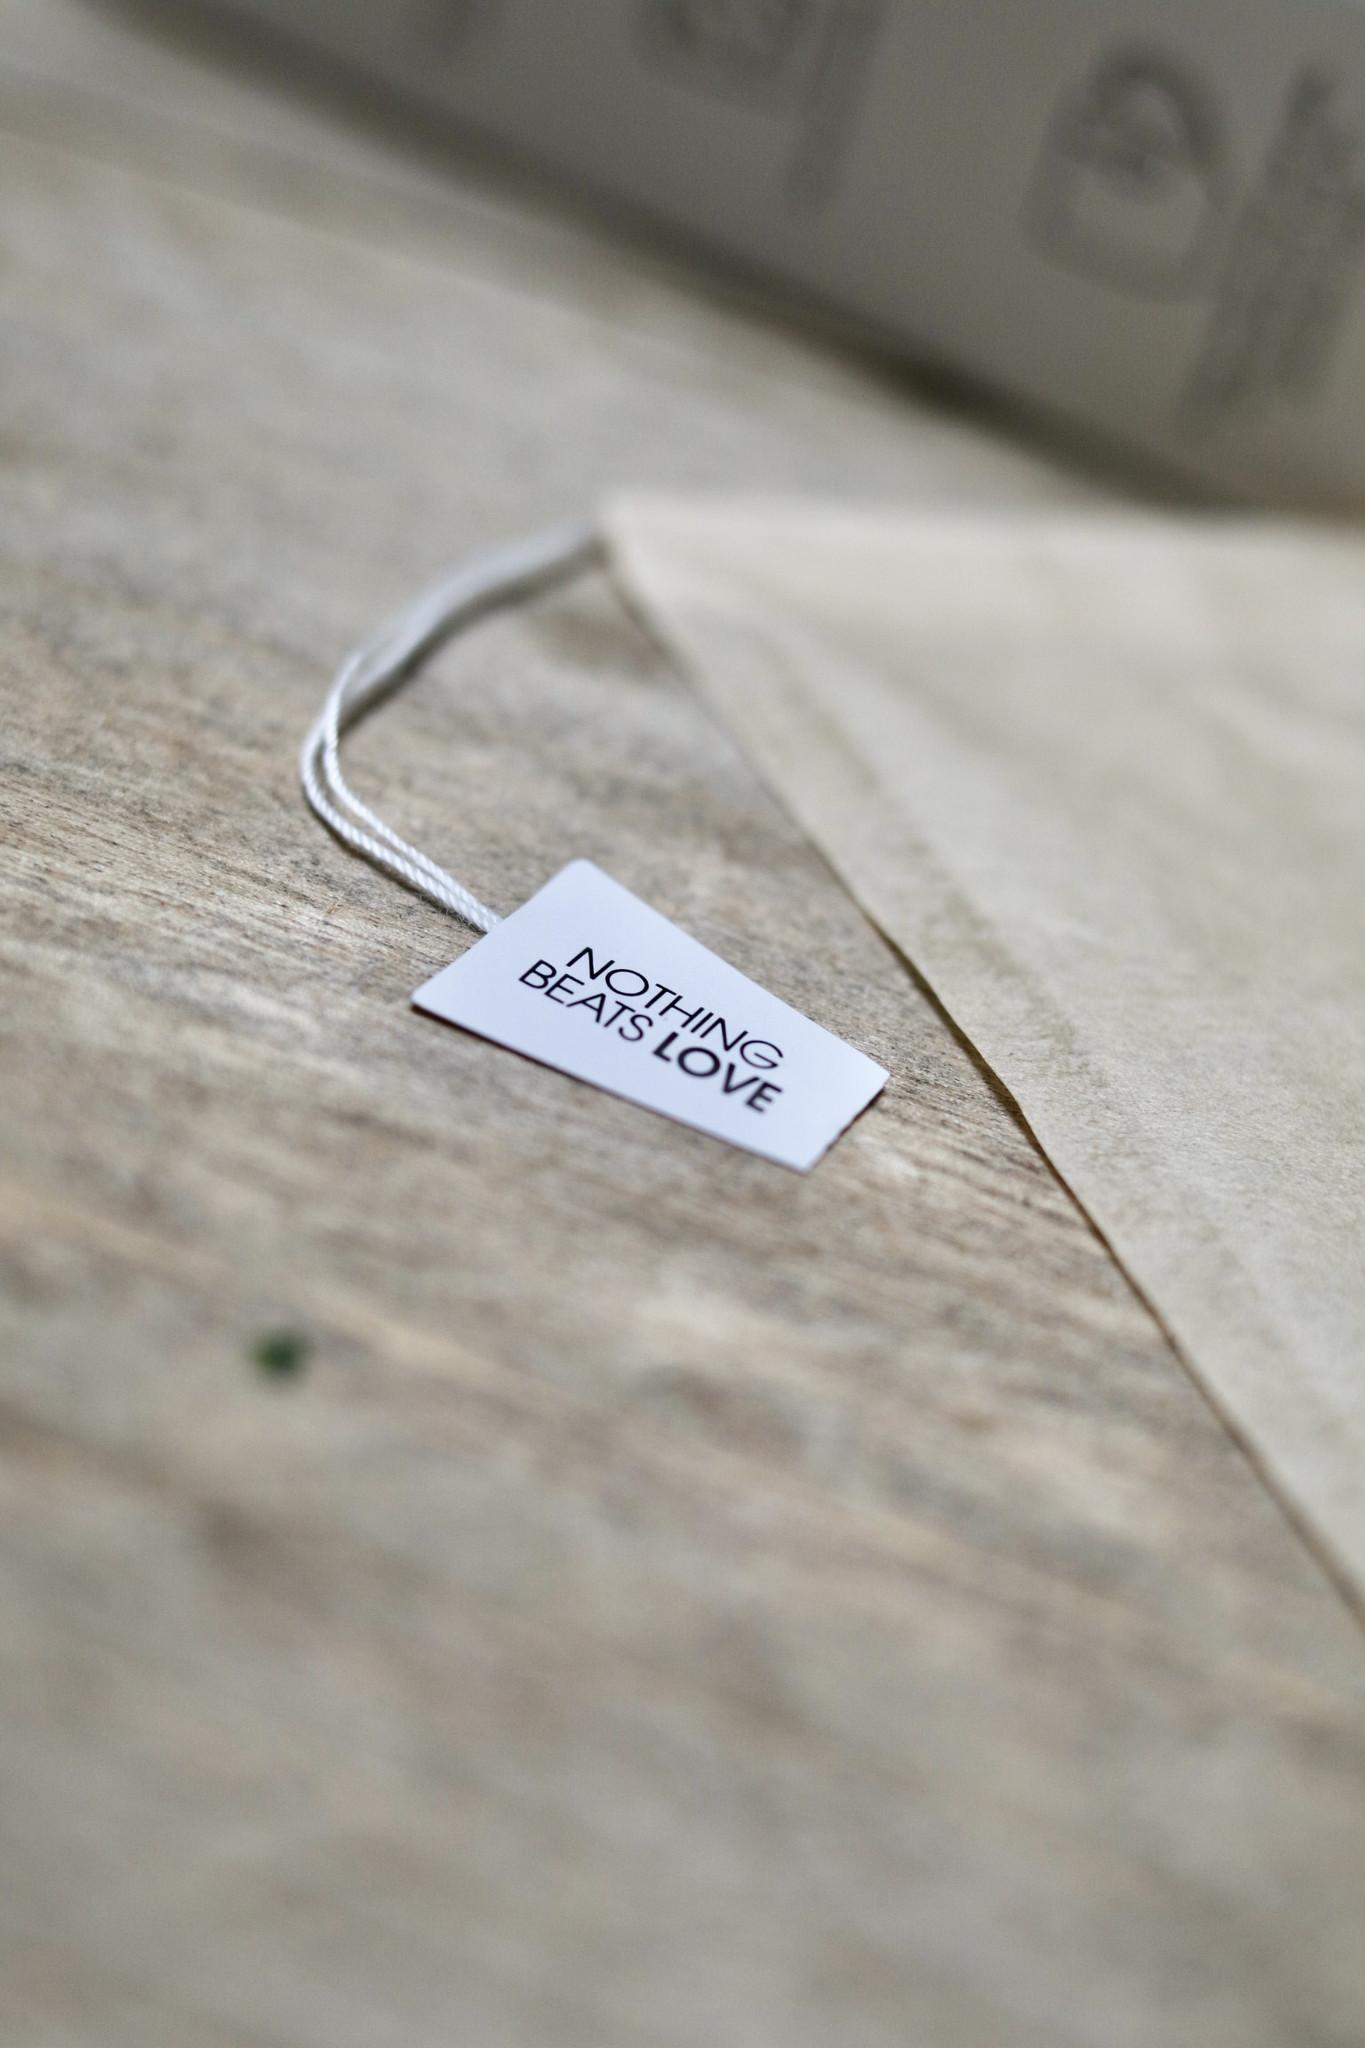 Biologisch afbreekbare theefilter zakjes